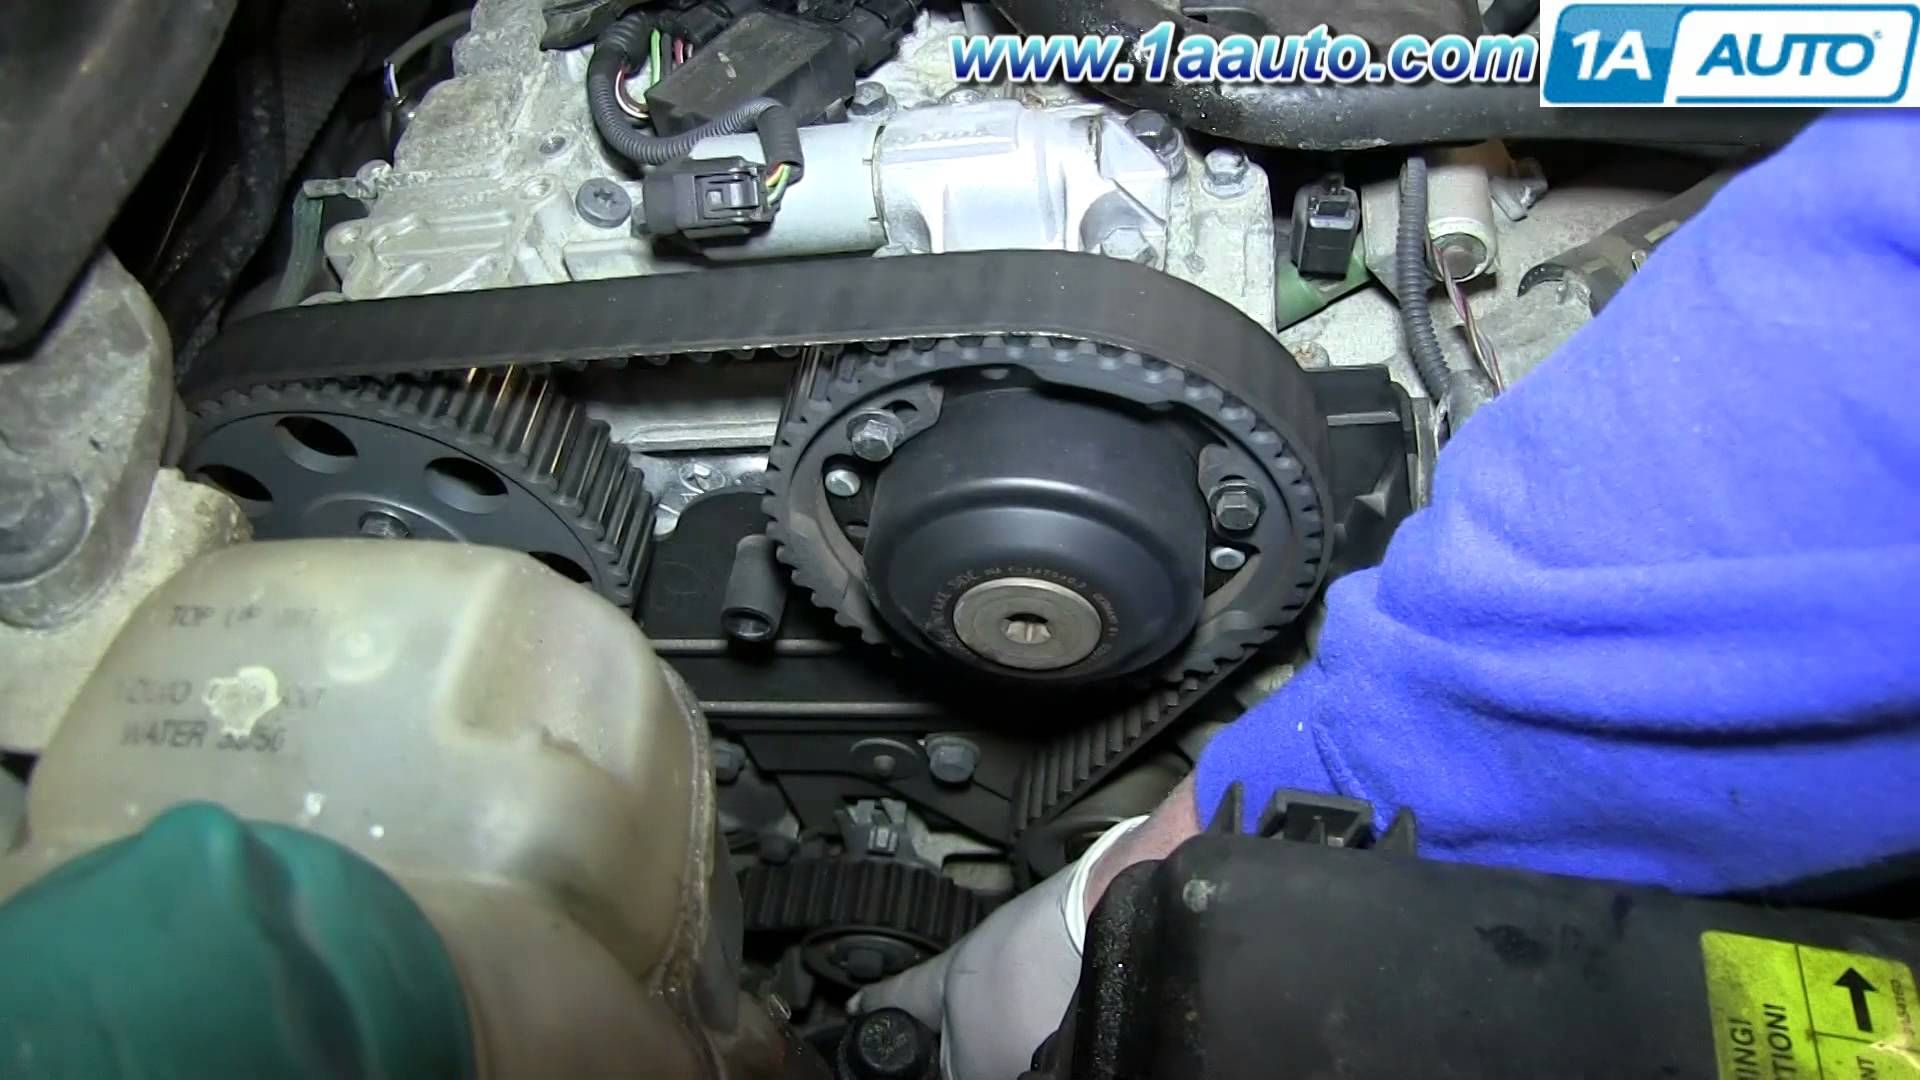 Http1aauto1atimingbeltsvolvov701atbk00041 1a auto engine sciox Image collections